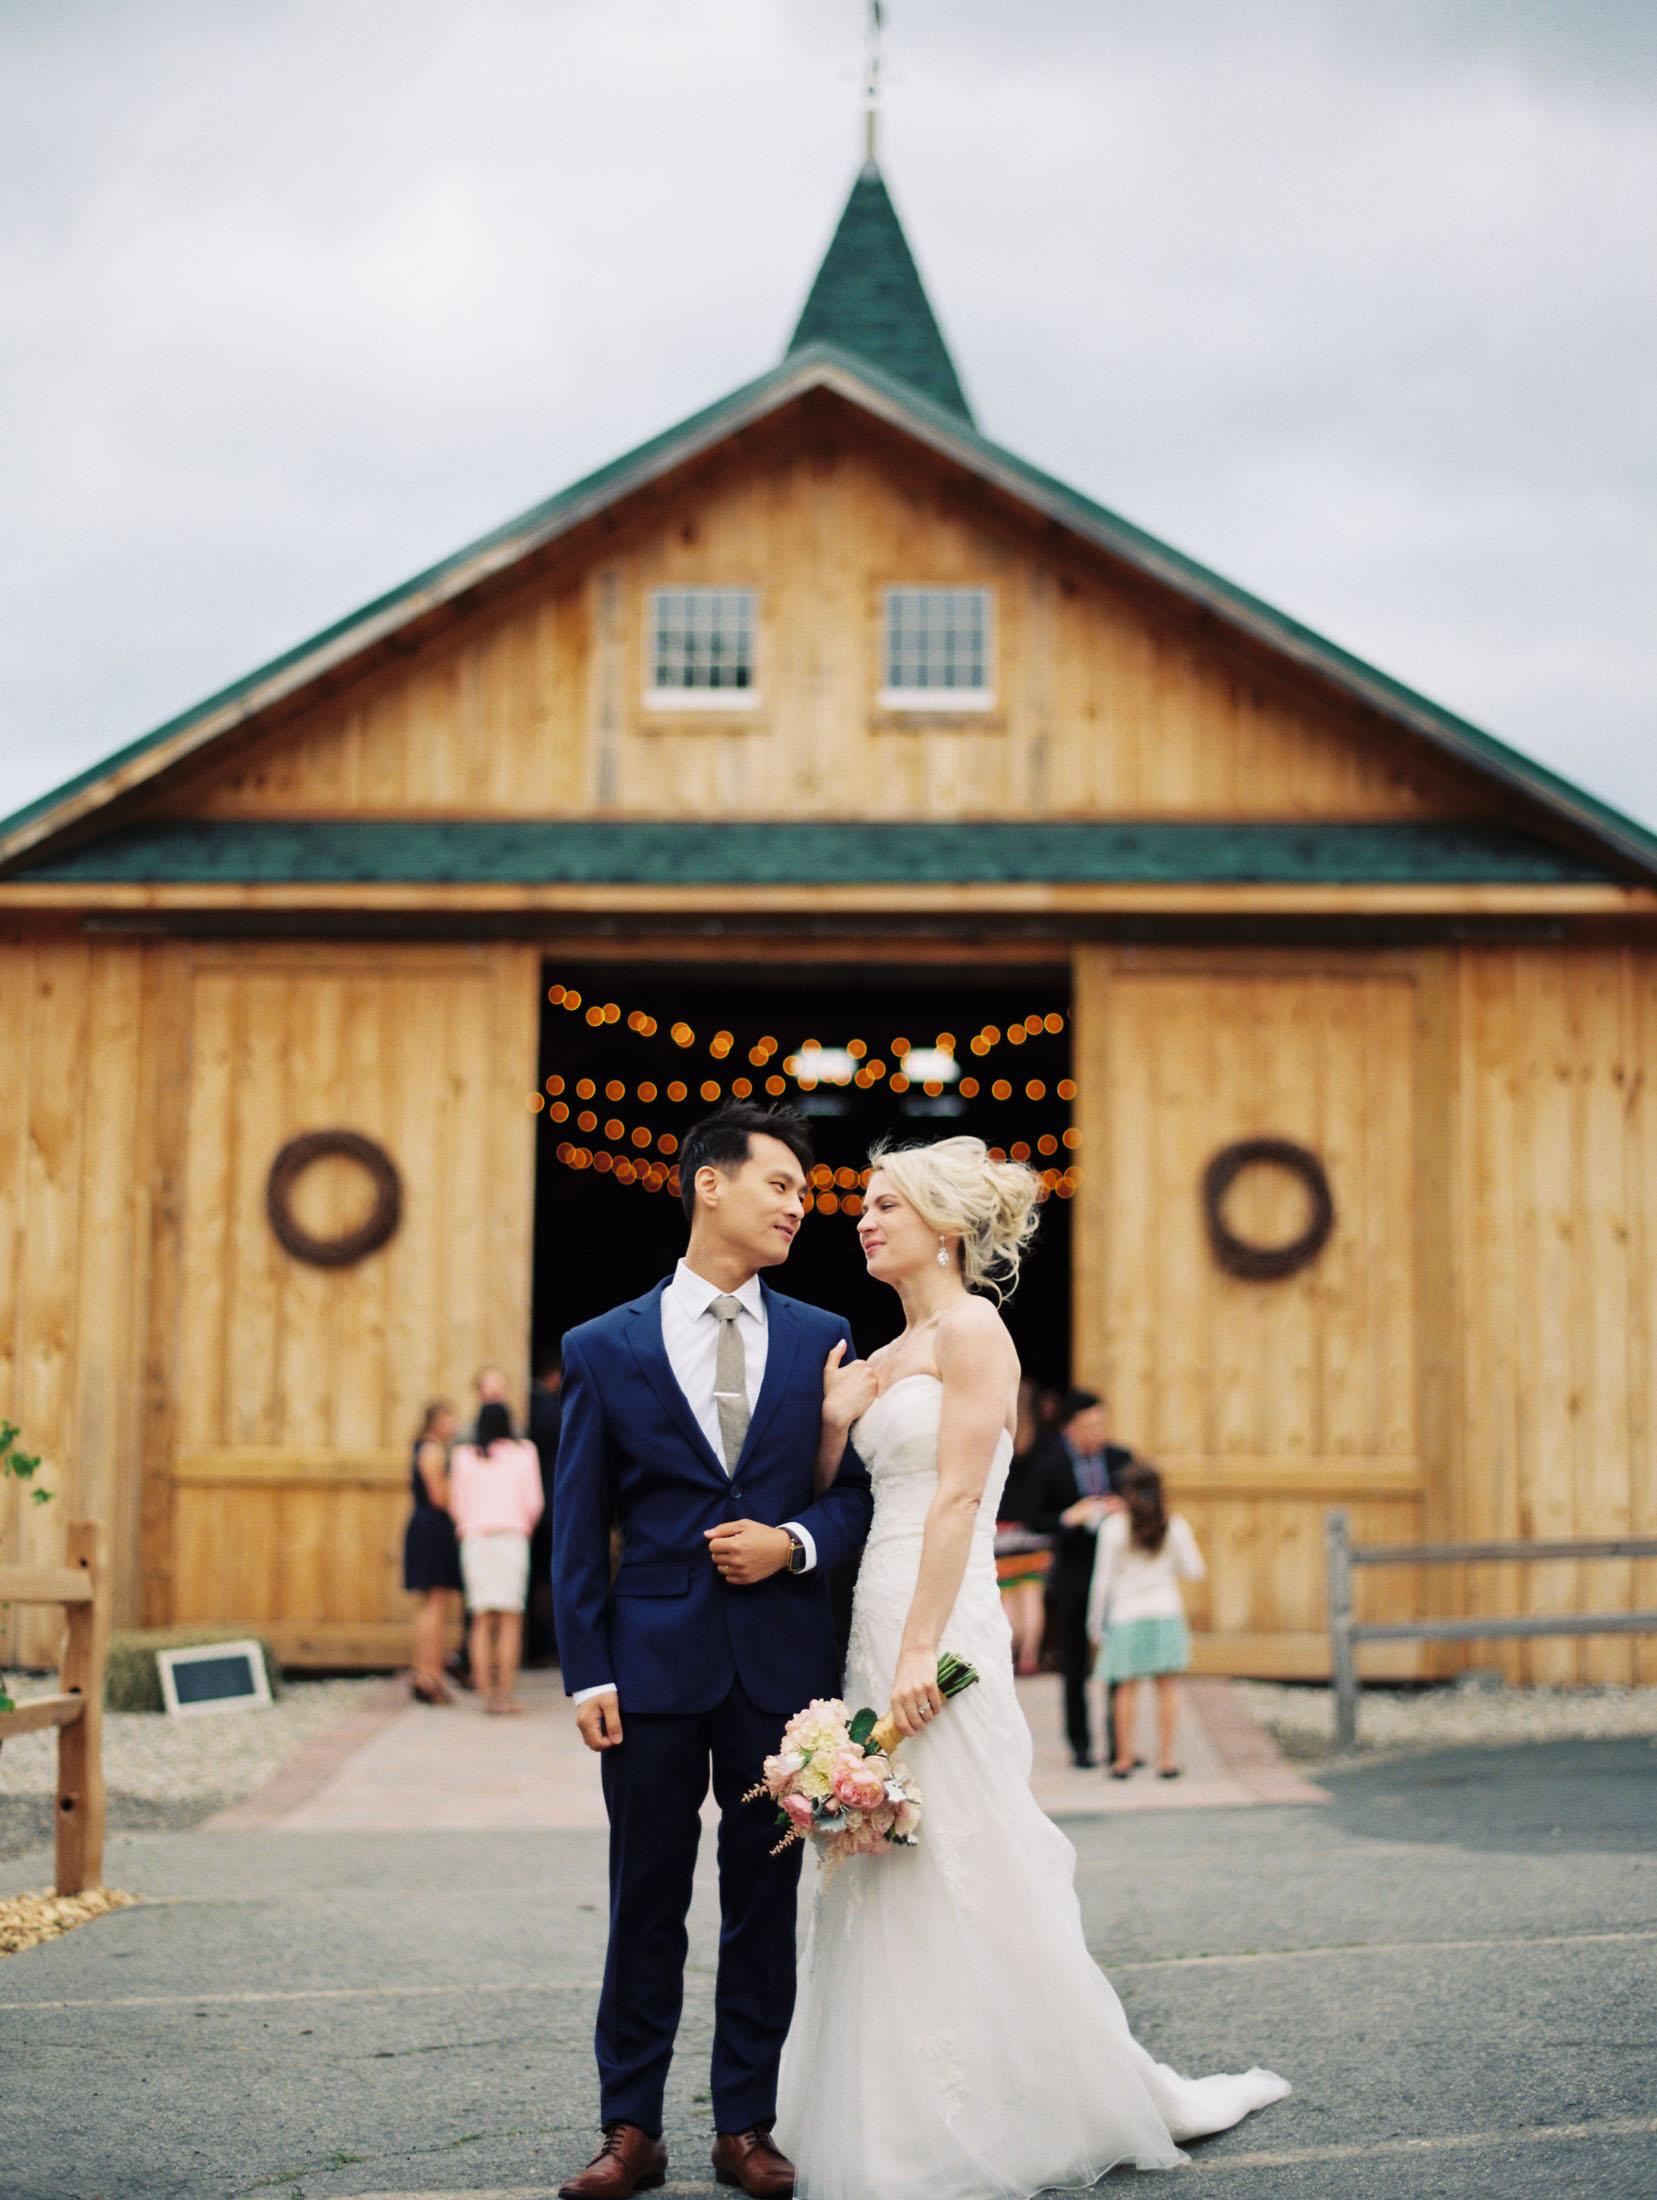 Blissful-Meadows-wedding-17.jpg